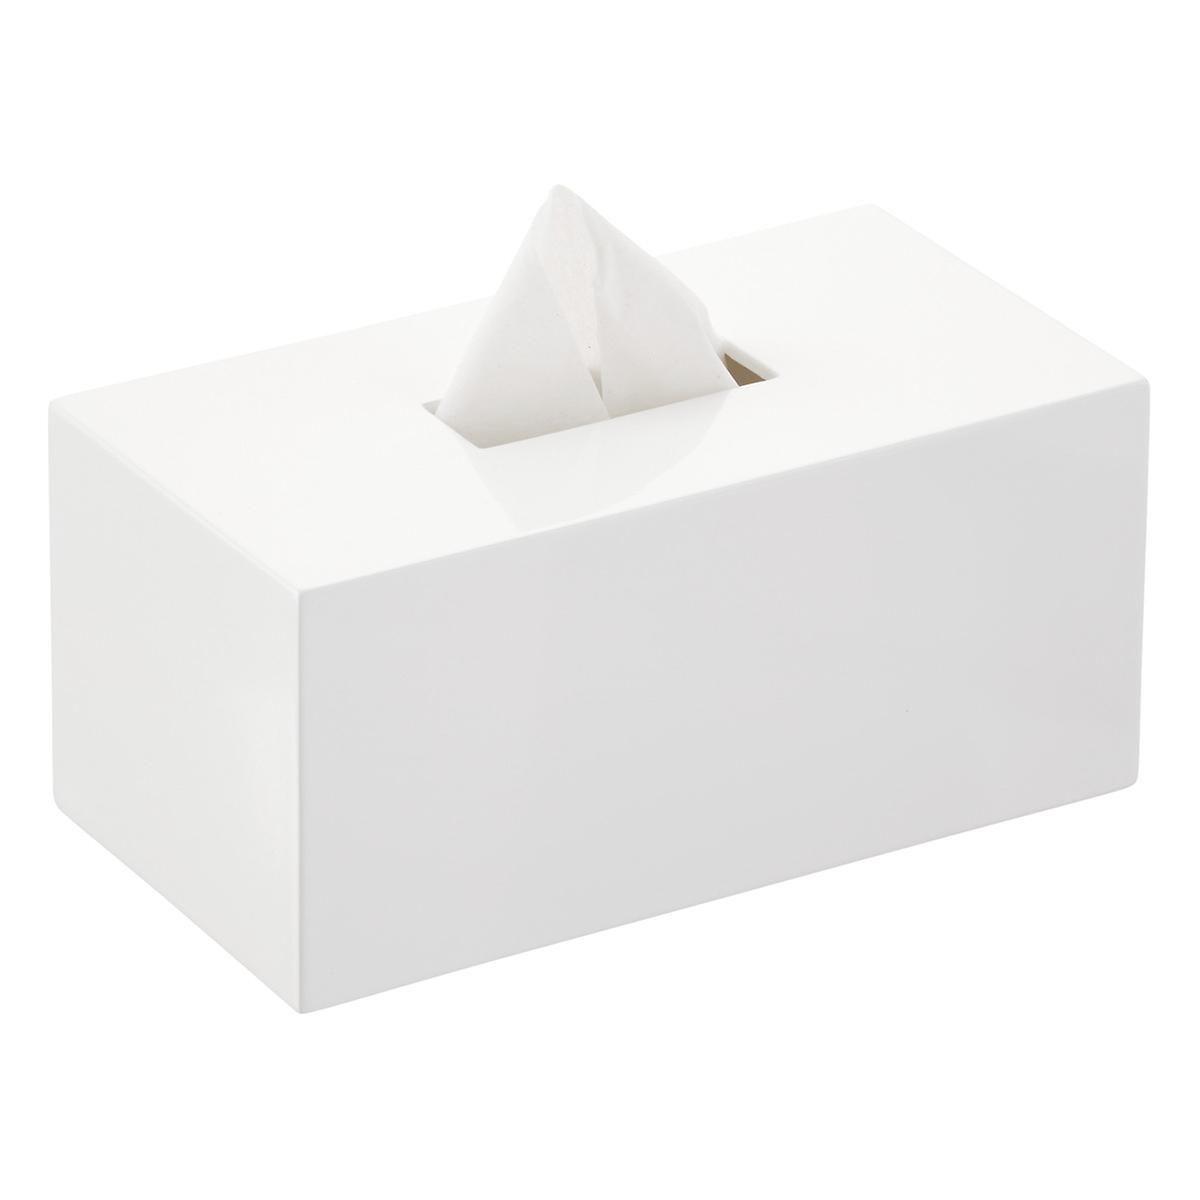 Lacquered Rectangular Tissue Box Cover Tissue Box Covers Covered Boxes Tissue Boxes